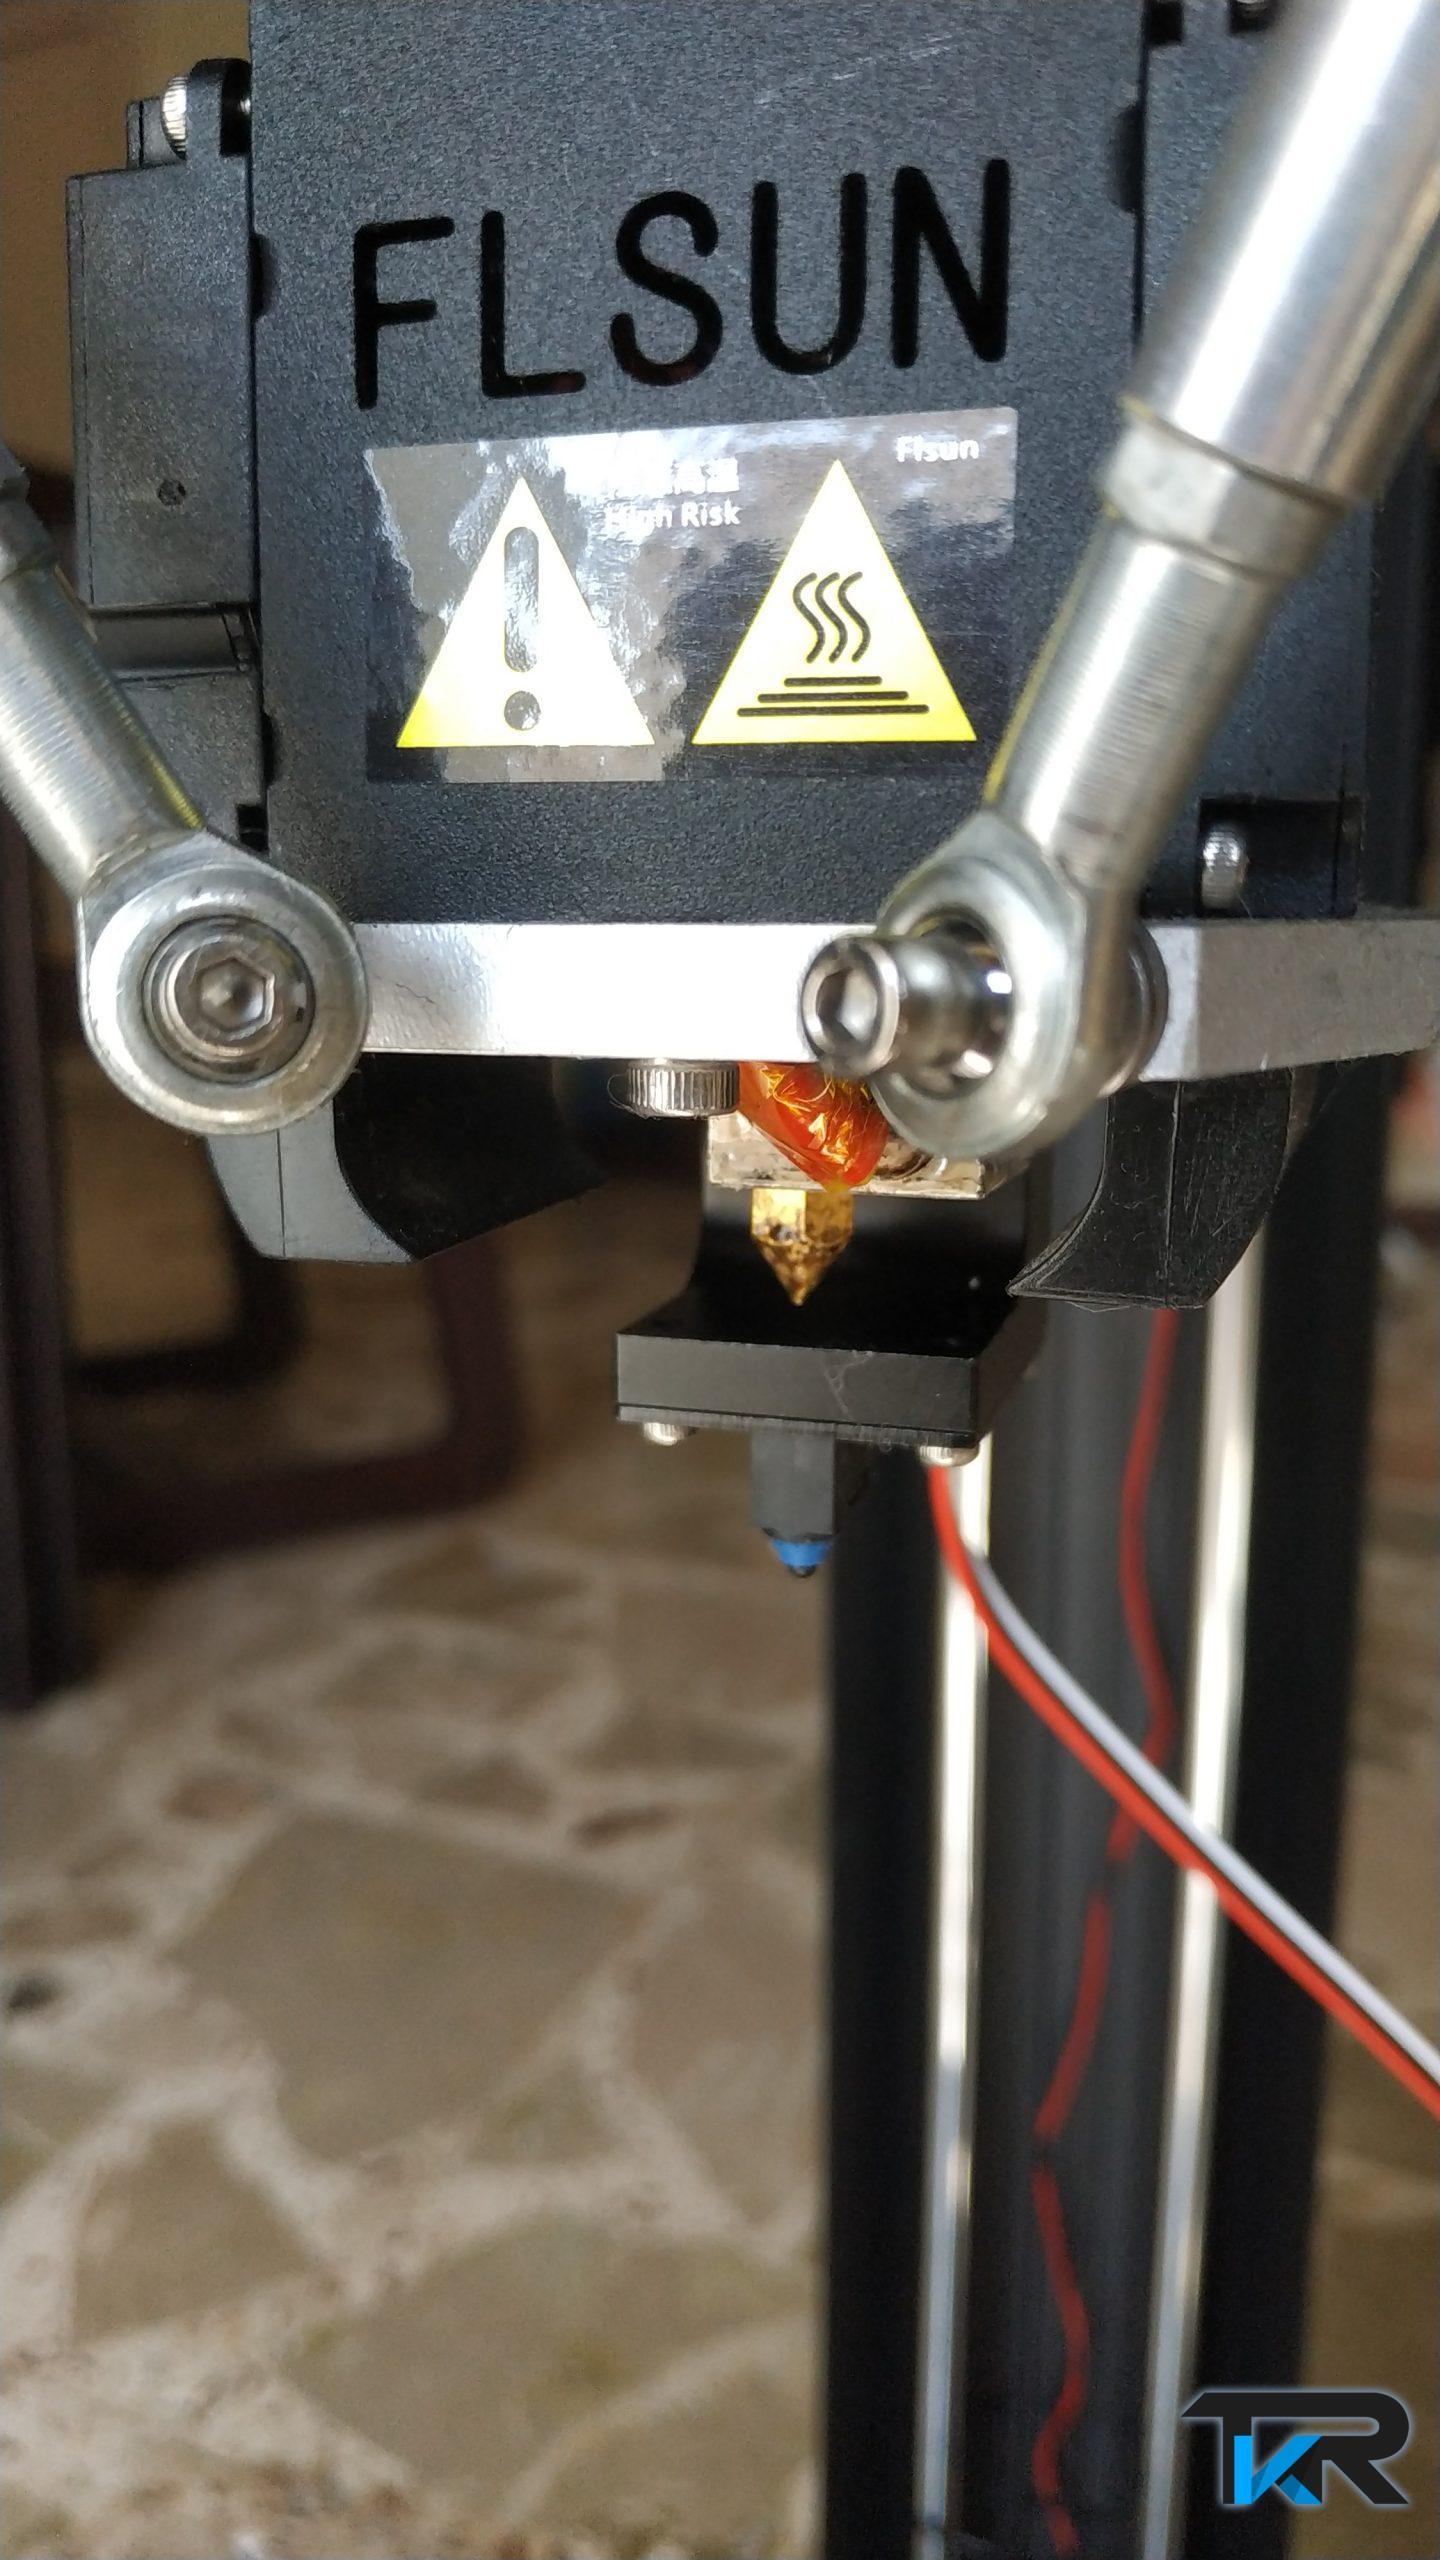 FLSUN QQ-S Review, una valida stampante 3D